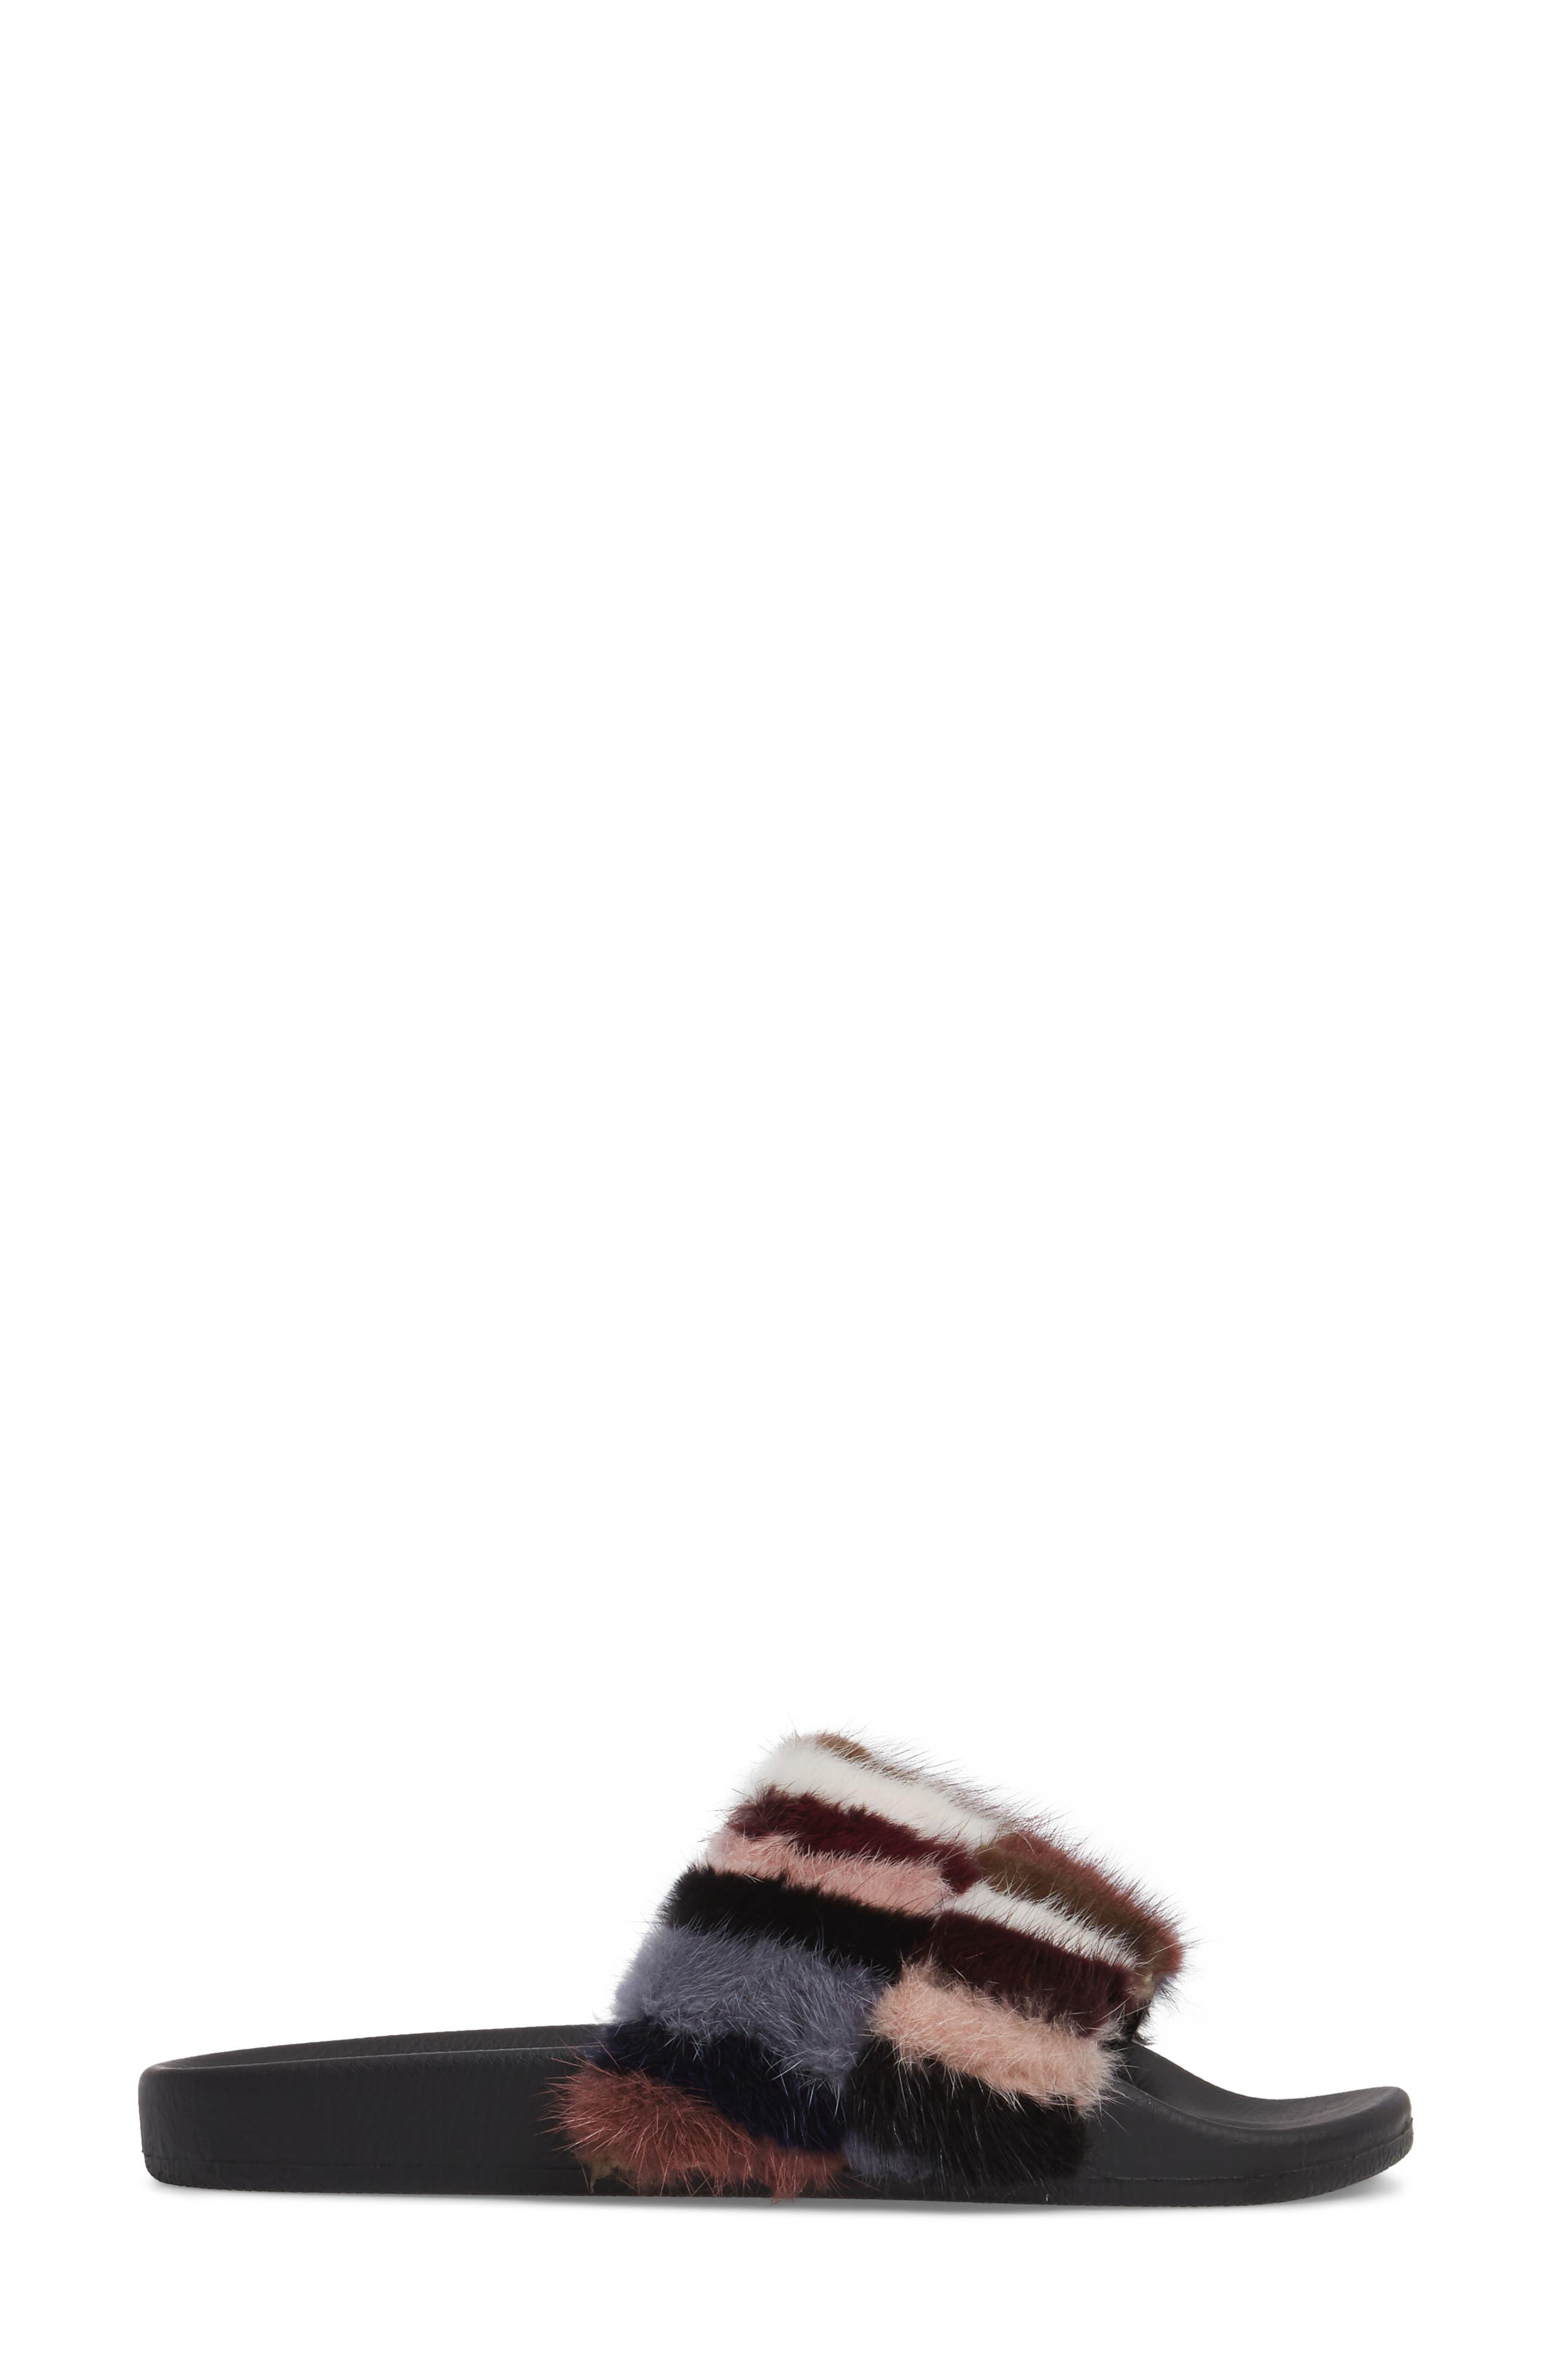 Sammi Genuine Fur Slide Sandal,                             Alternate thumbnail 3, color,                             Multi Fur